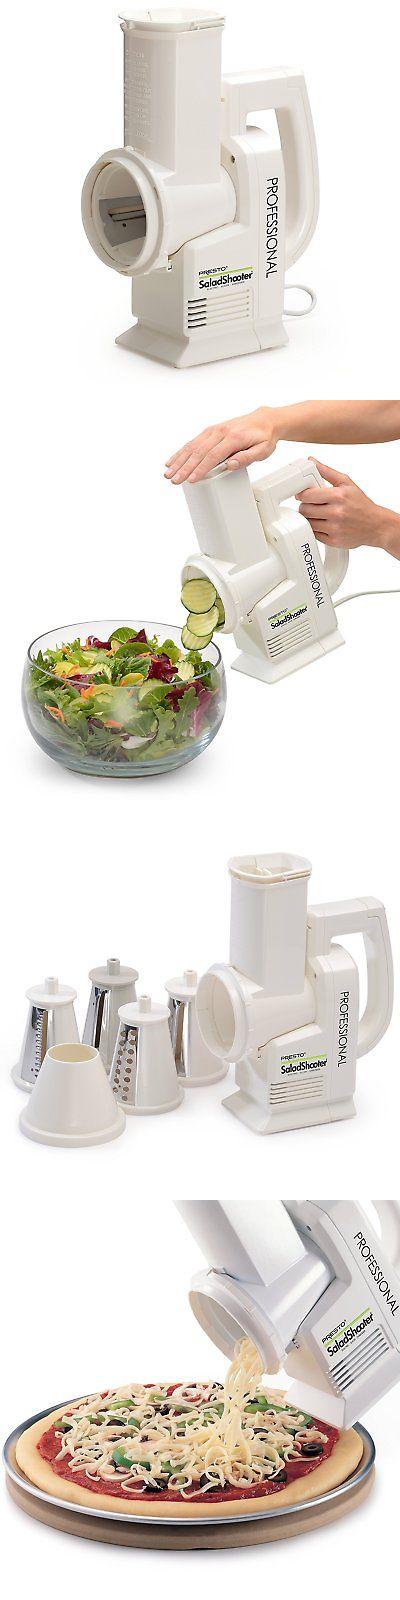 Food Processors 20673: Electric Slicer Shredder Professional Salad Shooter Chops  Vegetable Fruit Cheese  U003e